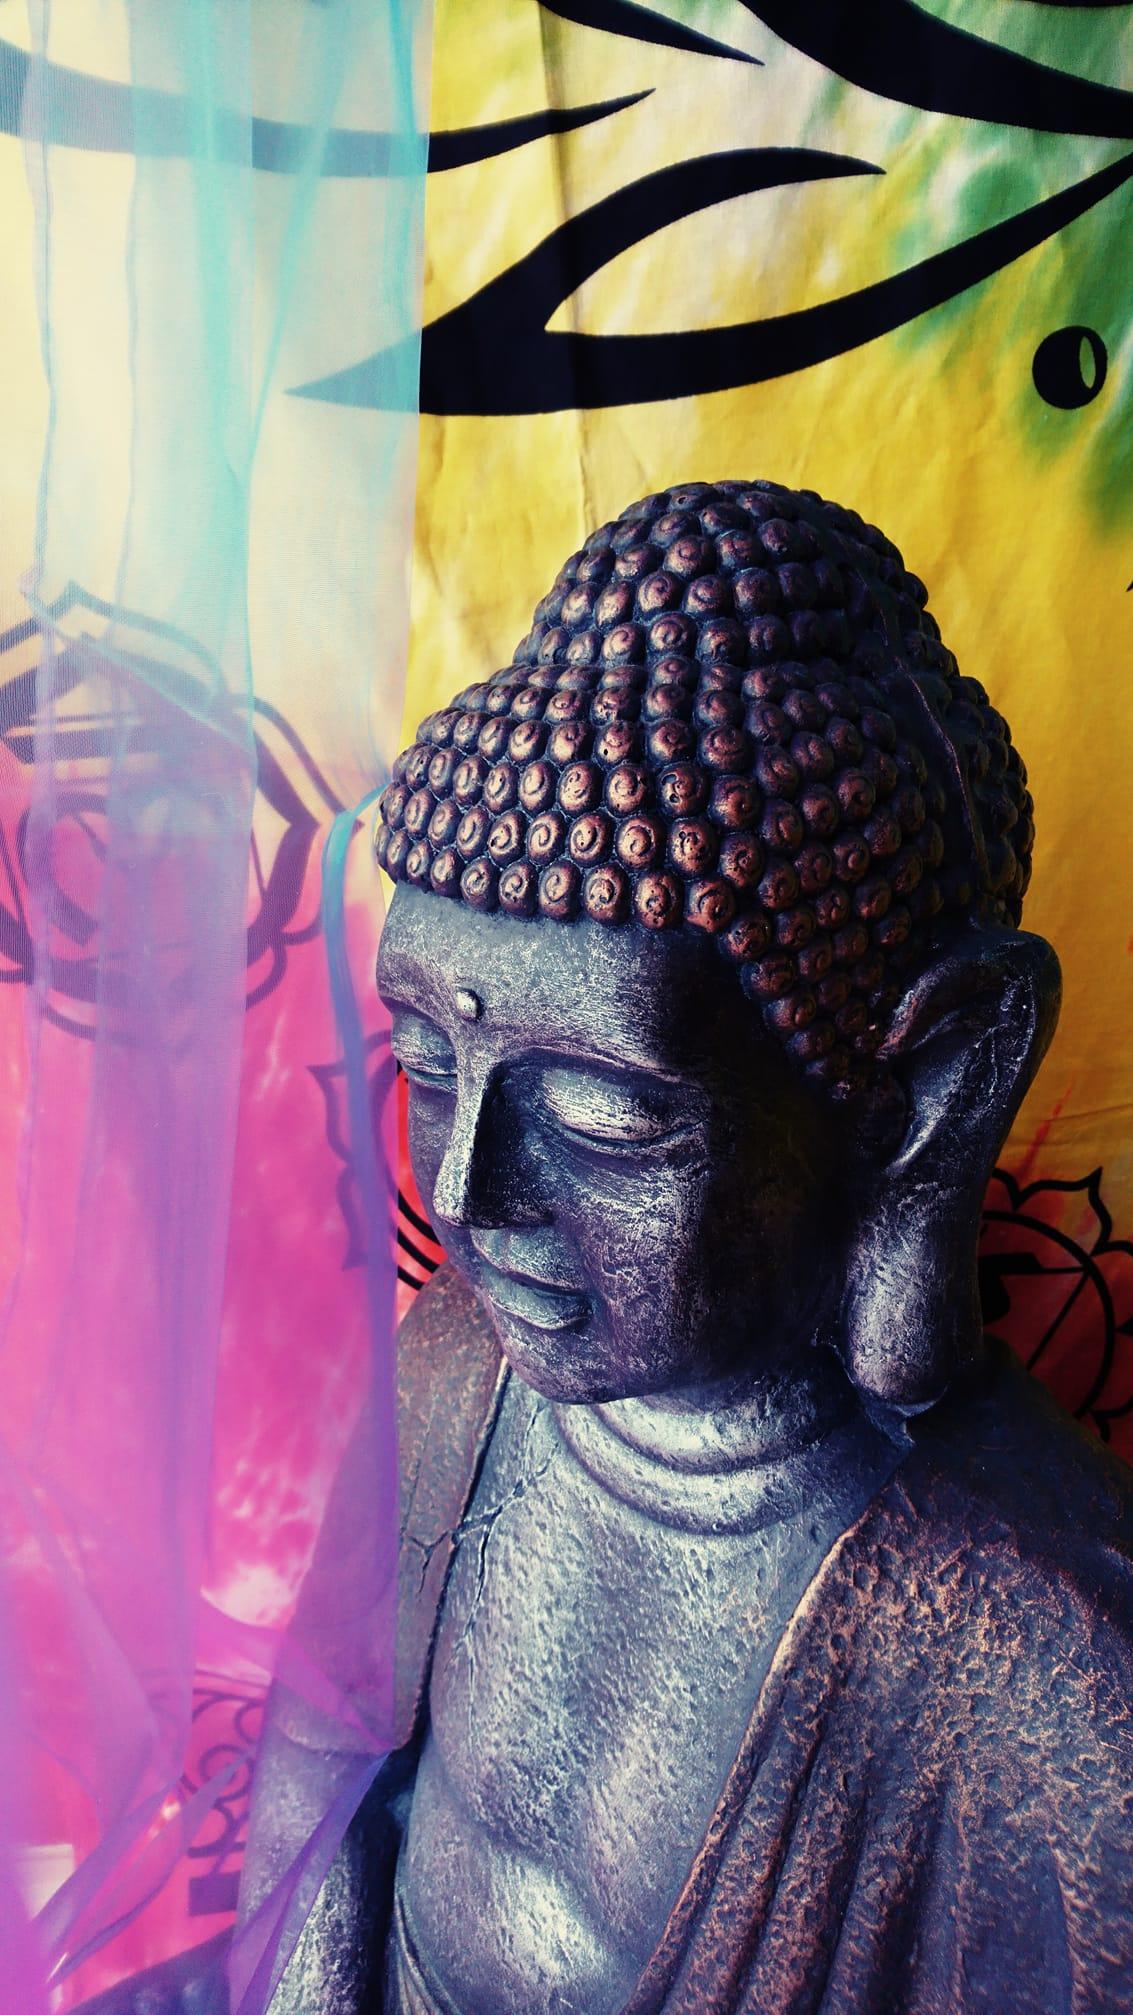 Buddha - Serenity in Saltburn